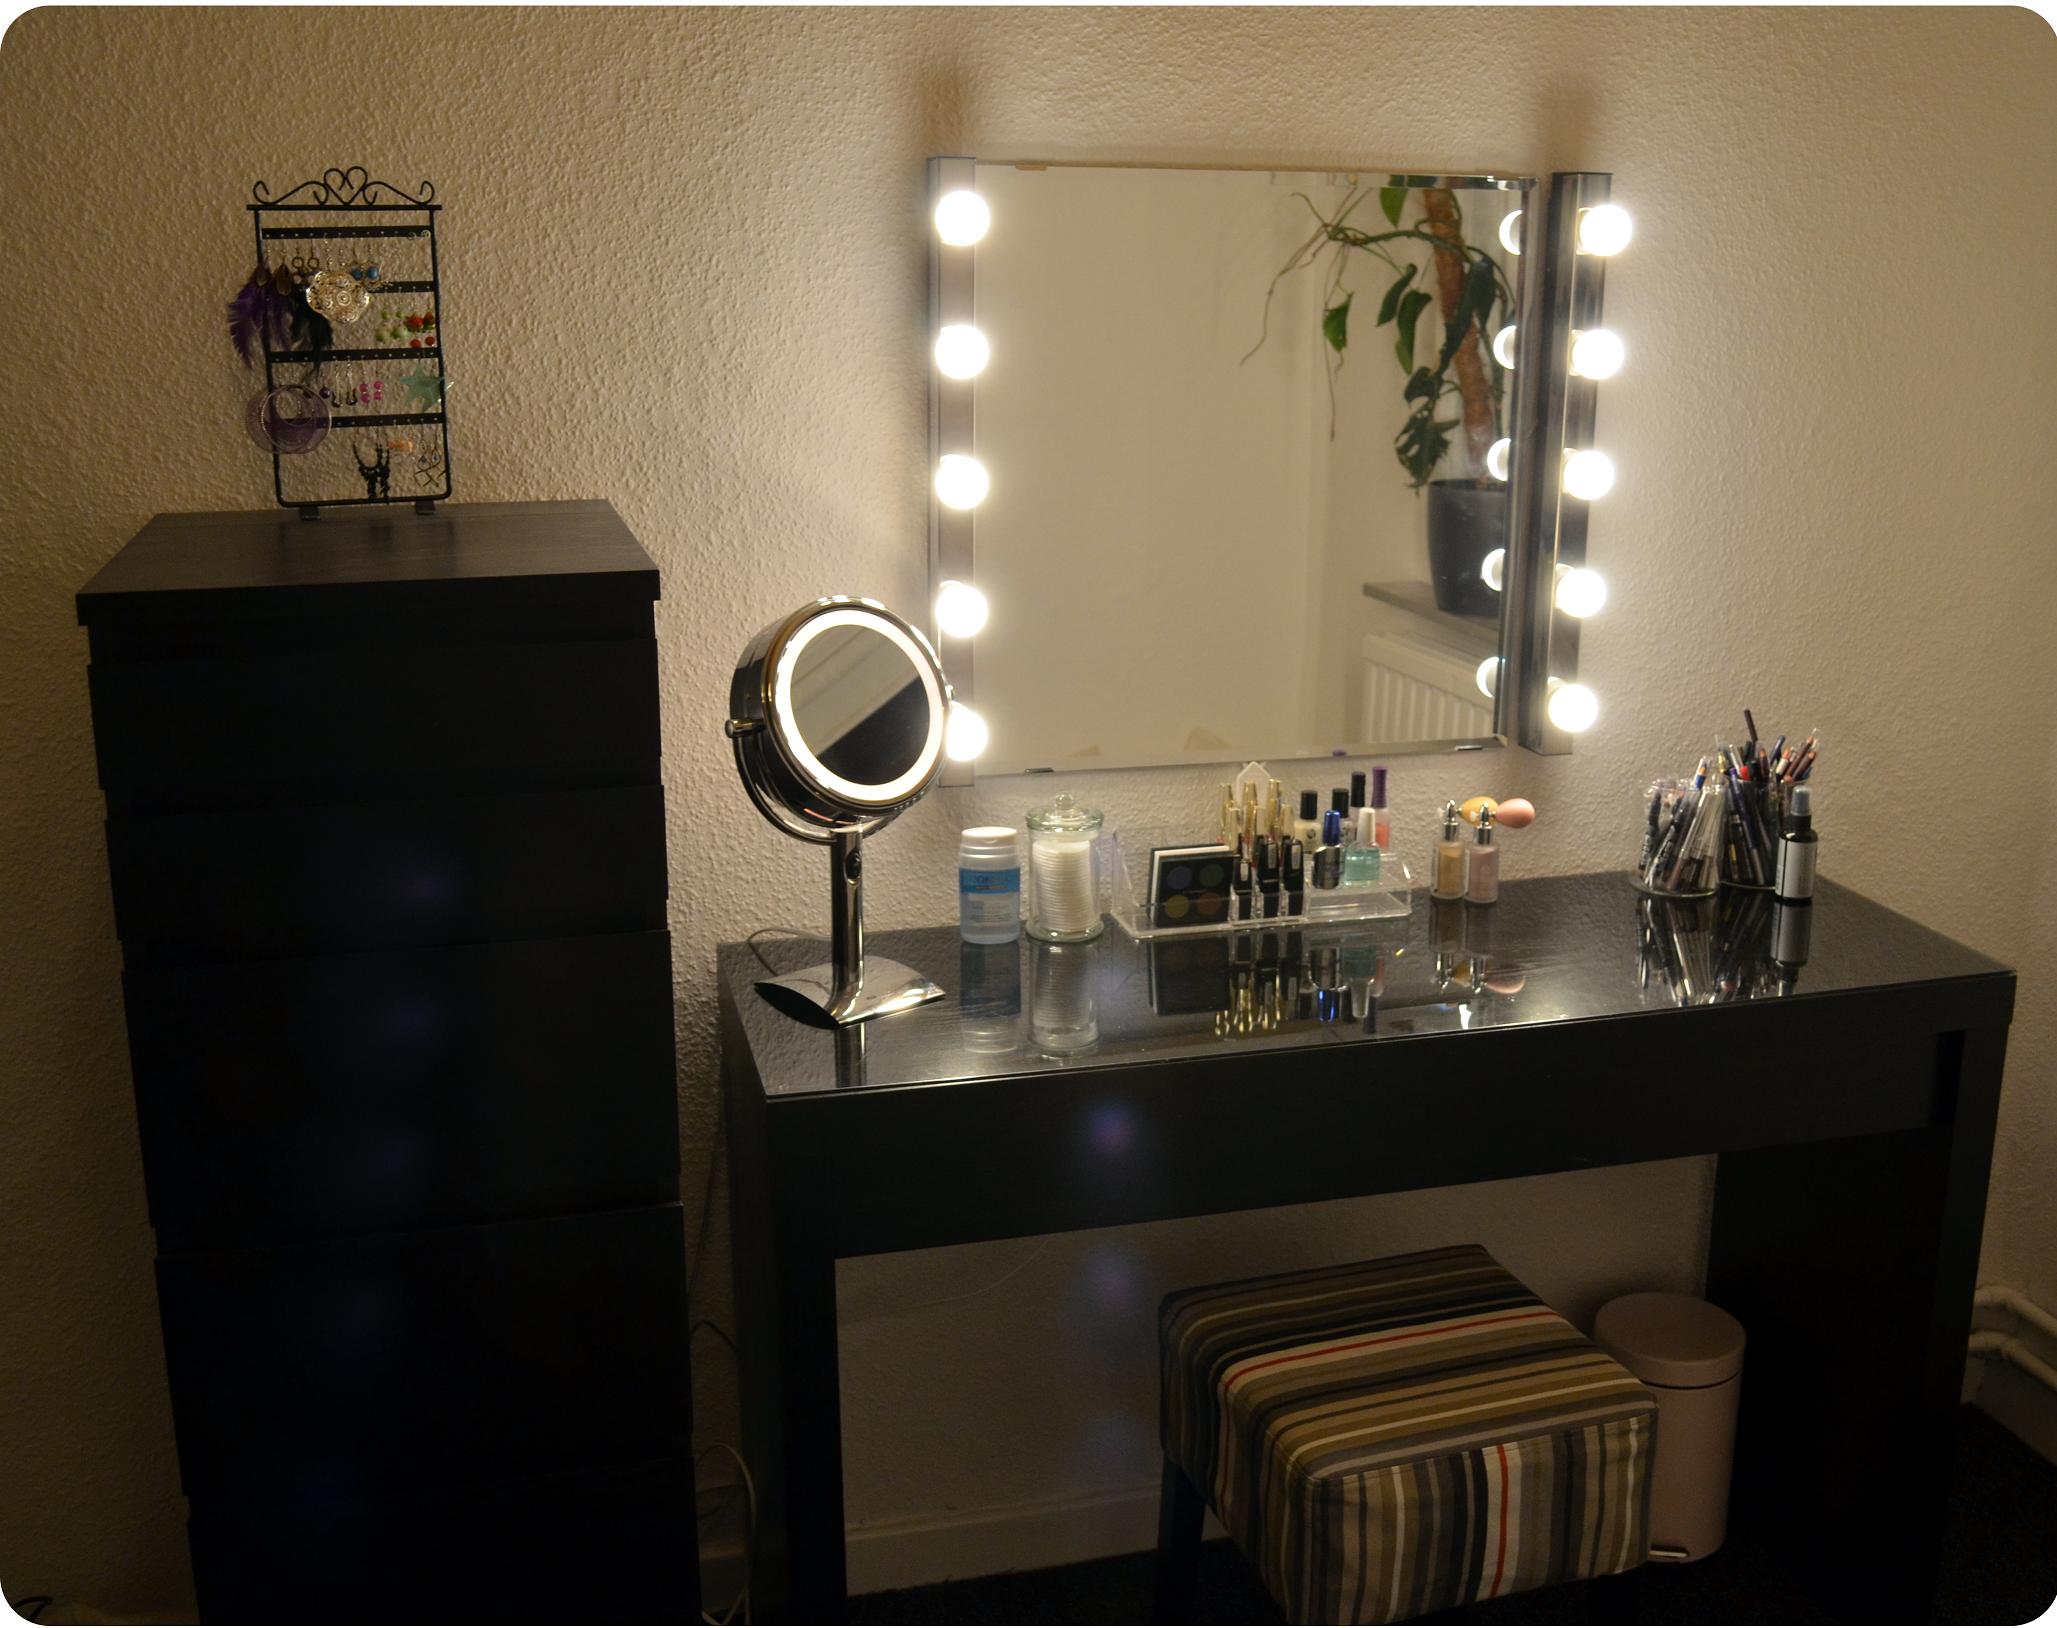 Ikea Malm Vanity, Ikea Kolja Mirror, Ikea Musik Vanity ...